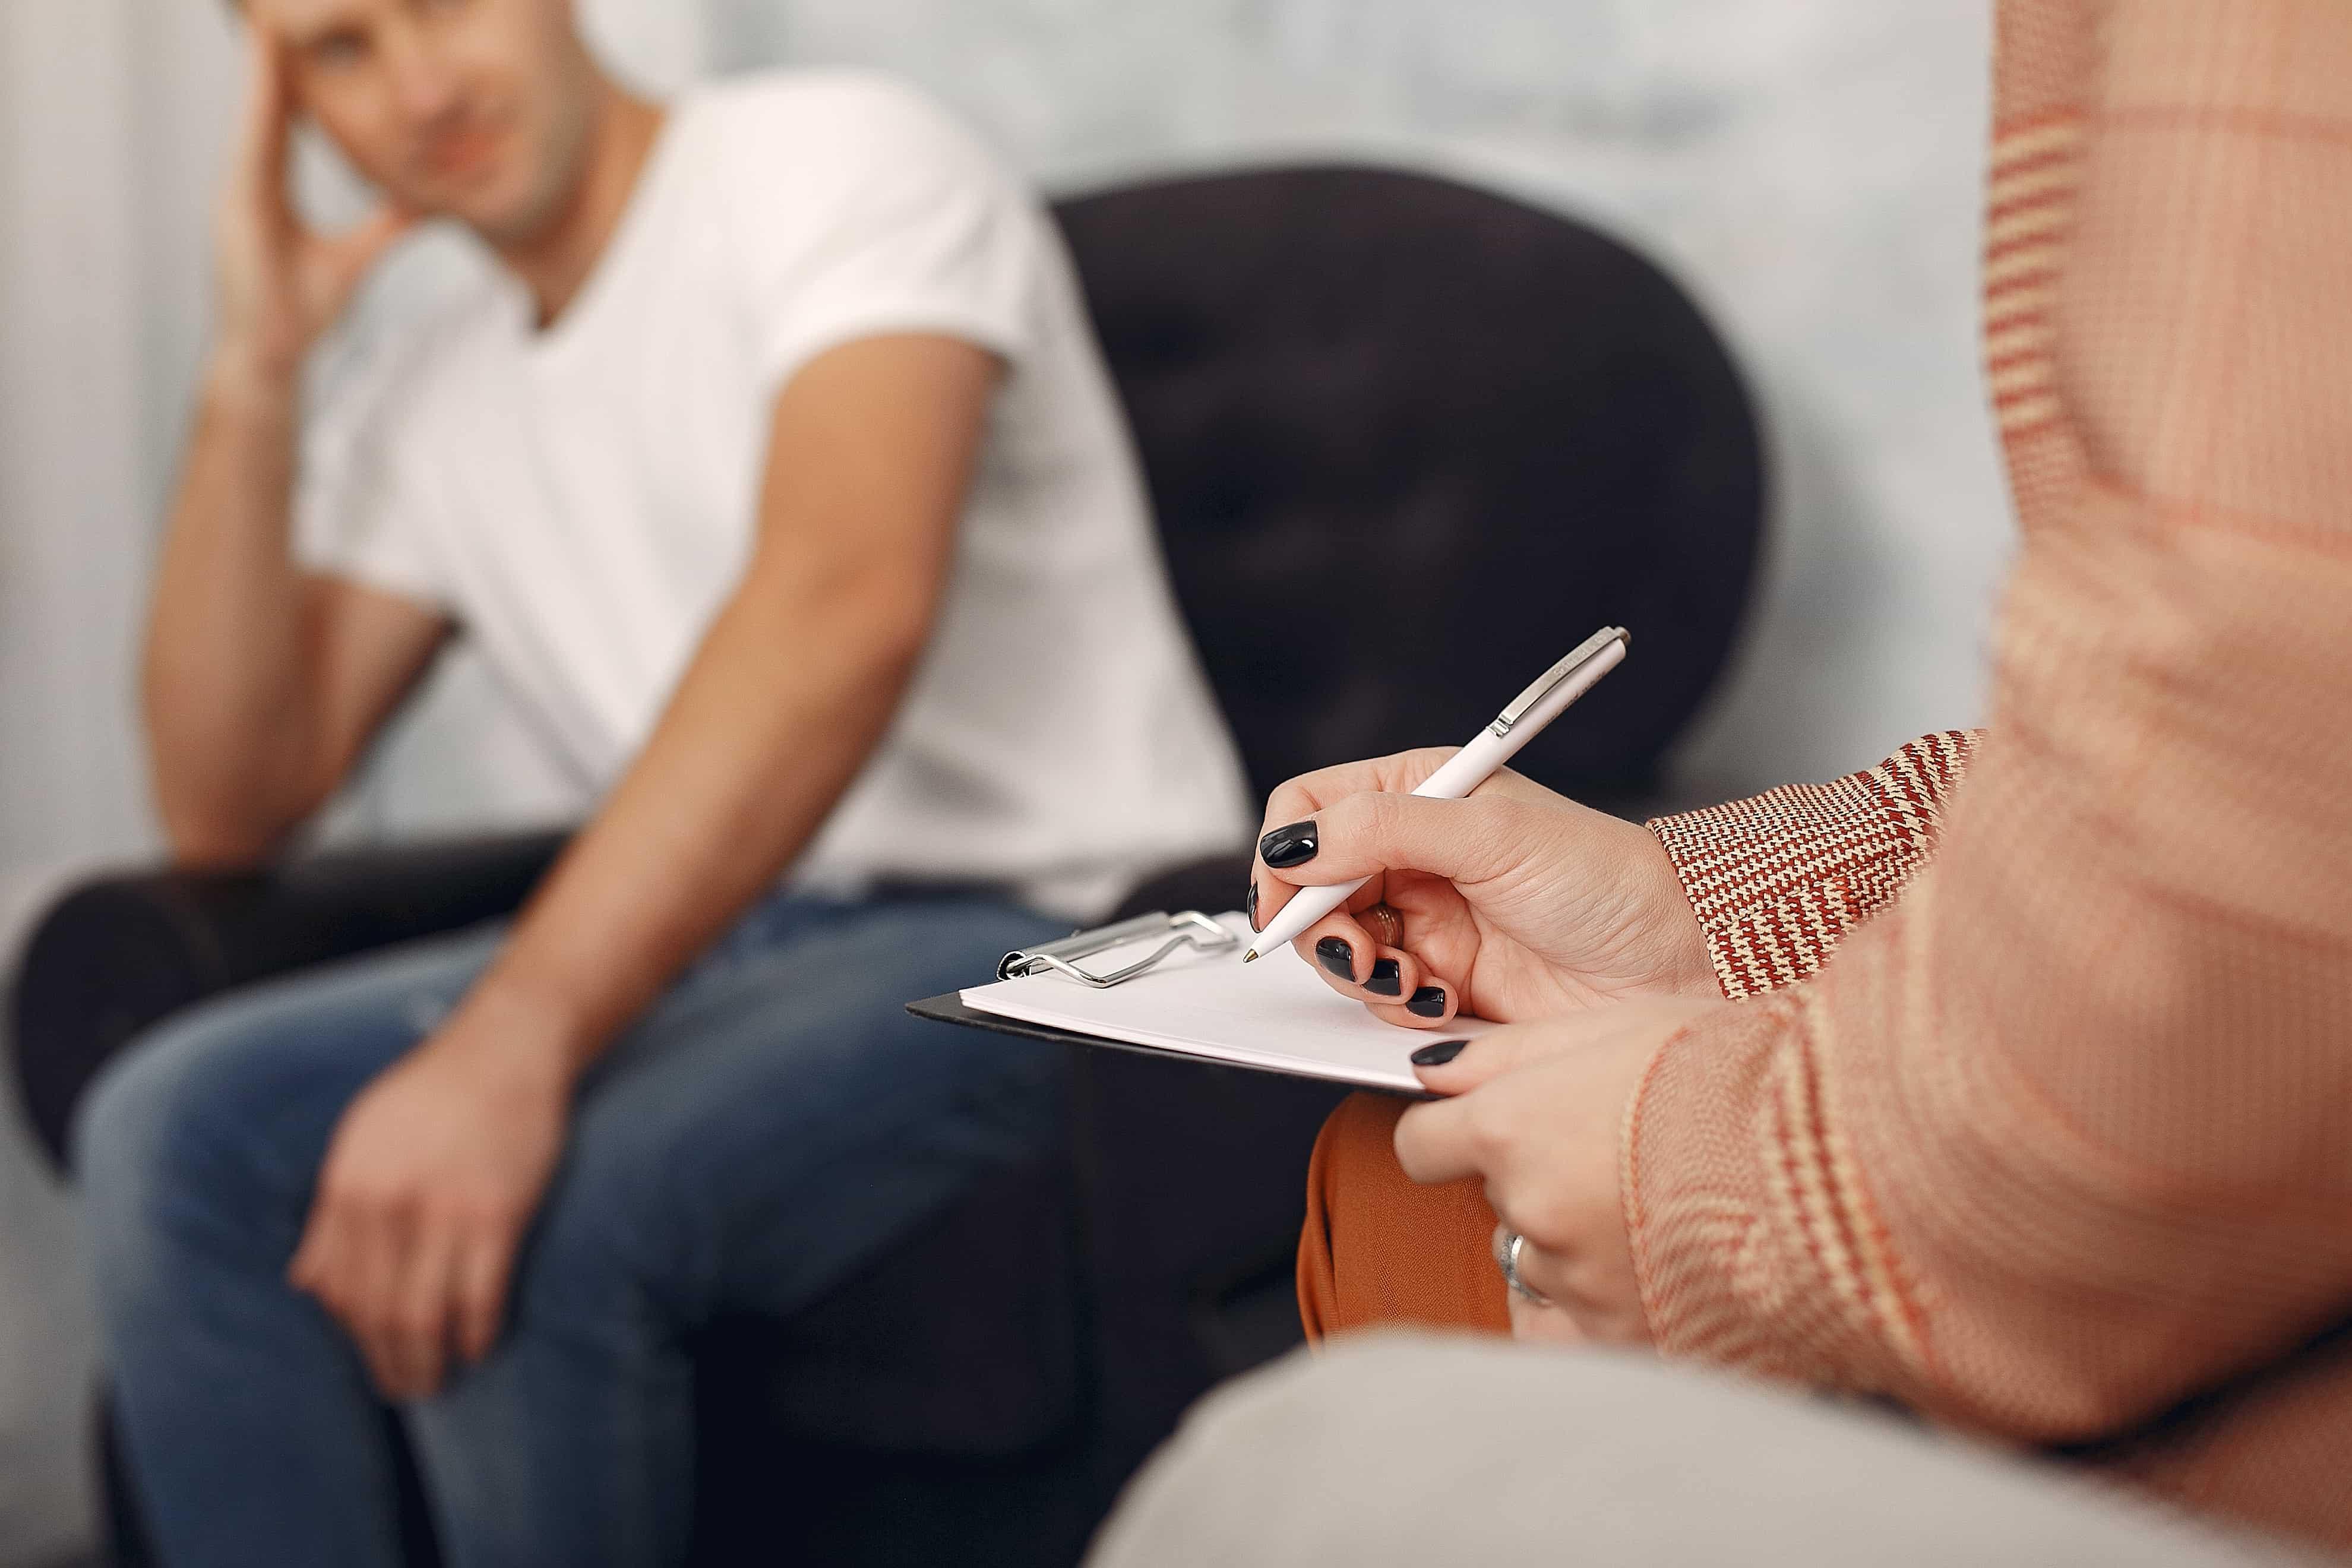 Bireysel Psikoterapi Nedir?